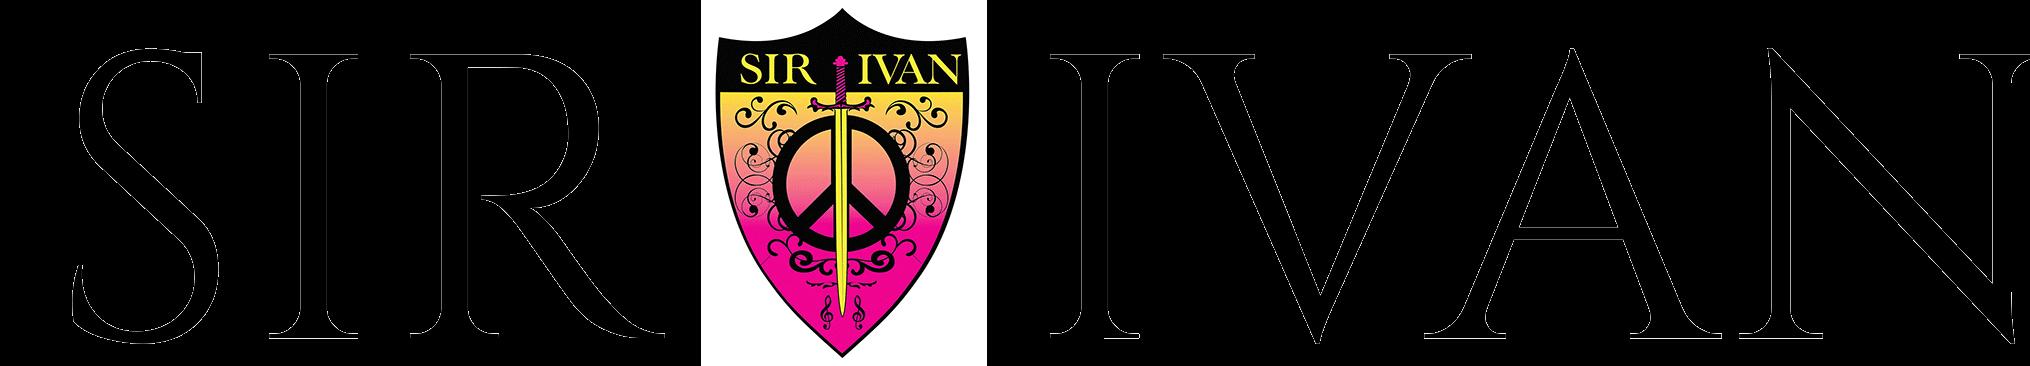 Sir Ivan